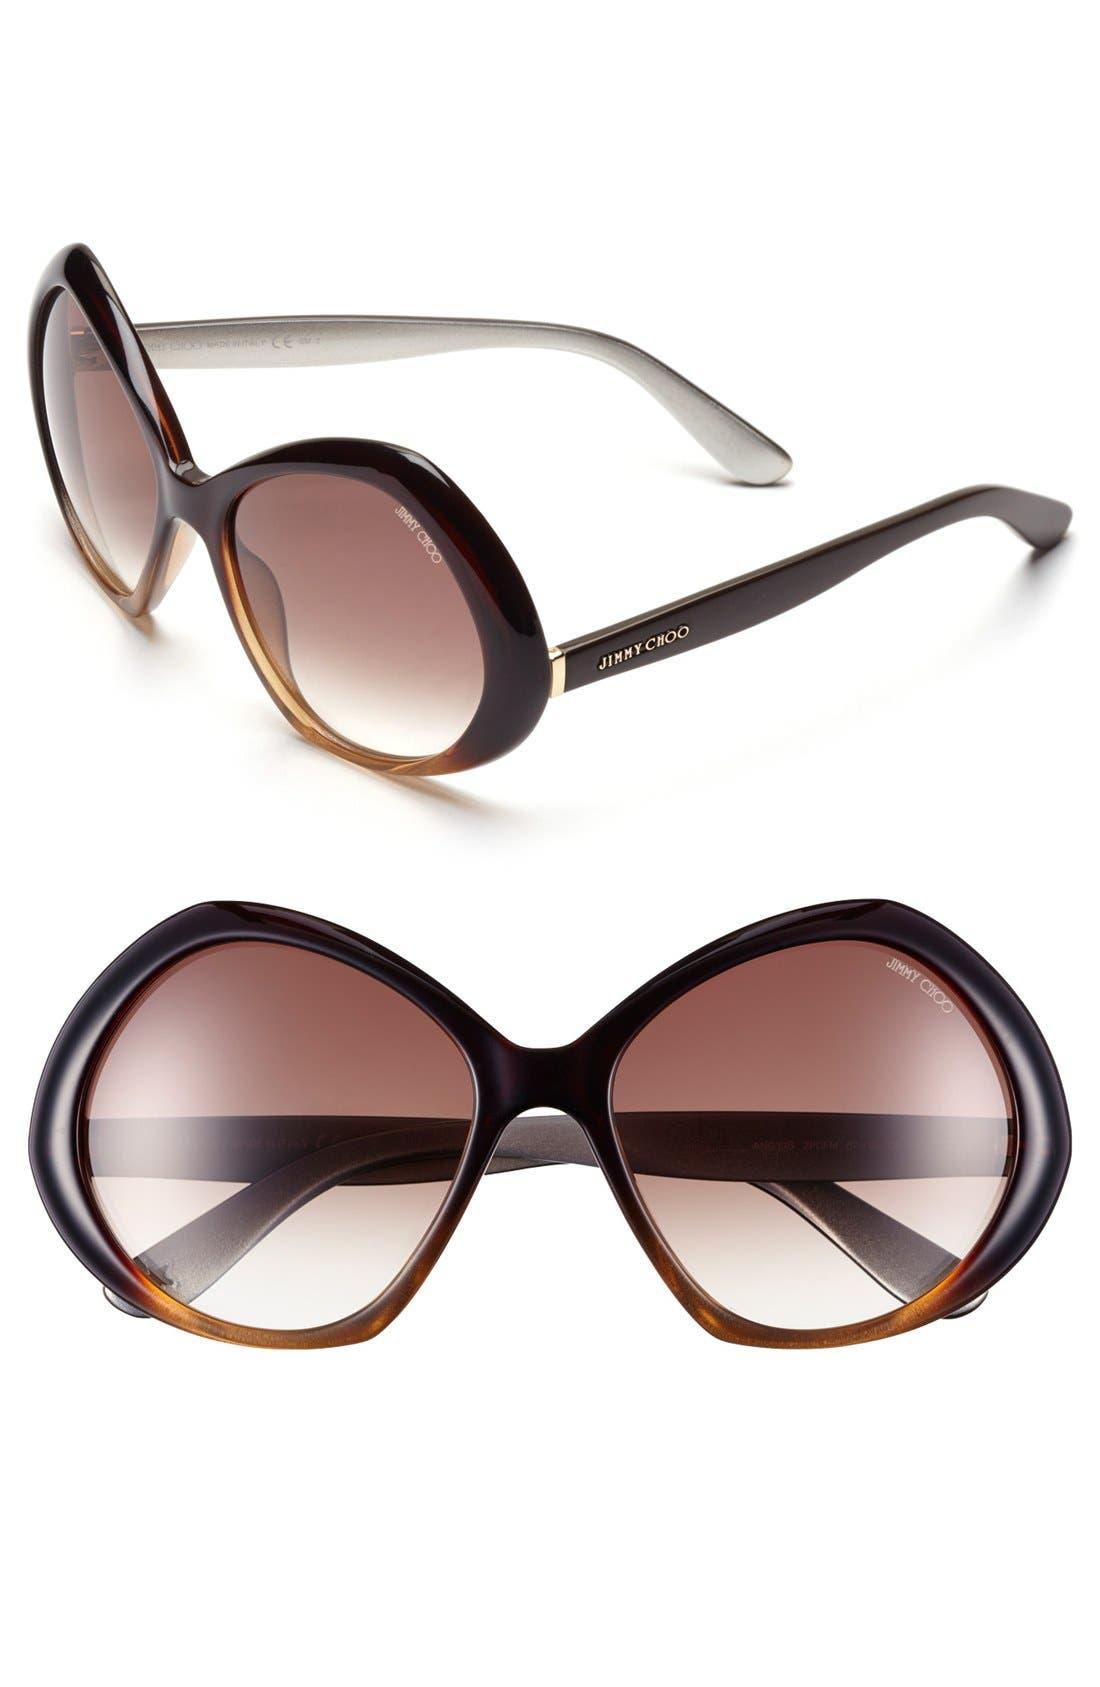 Main Image - Jimmy Choo 57mm Oversized Sunglasses